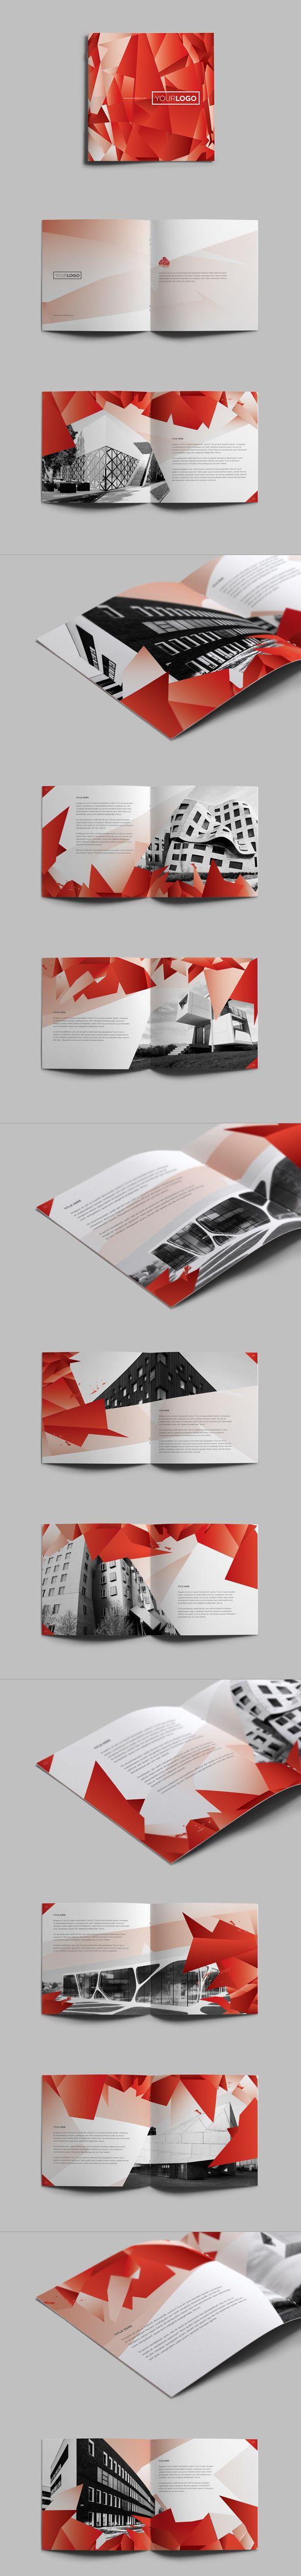 Brochure Design | Designer: Abra Design